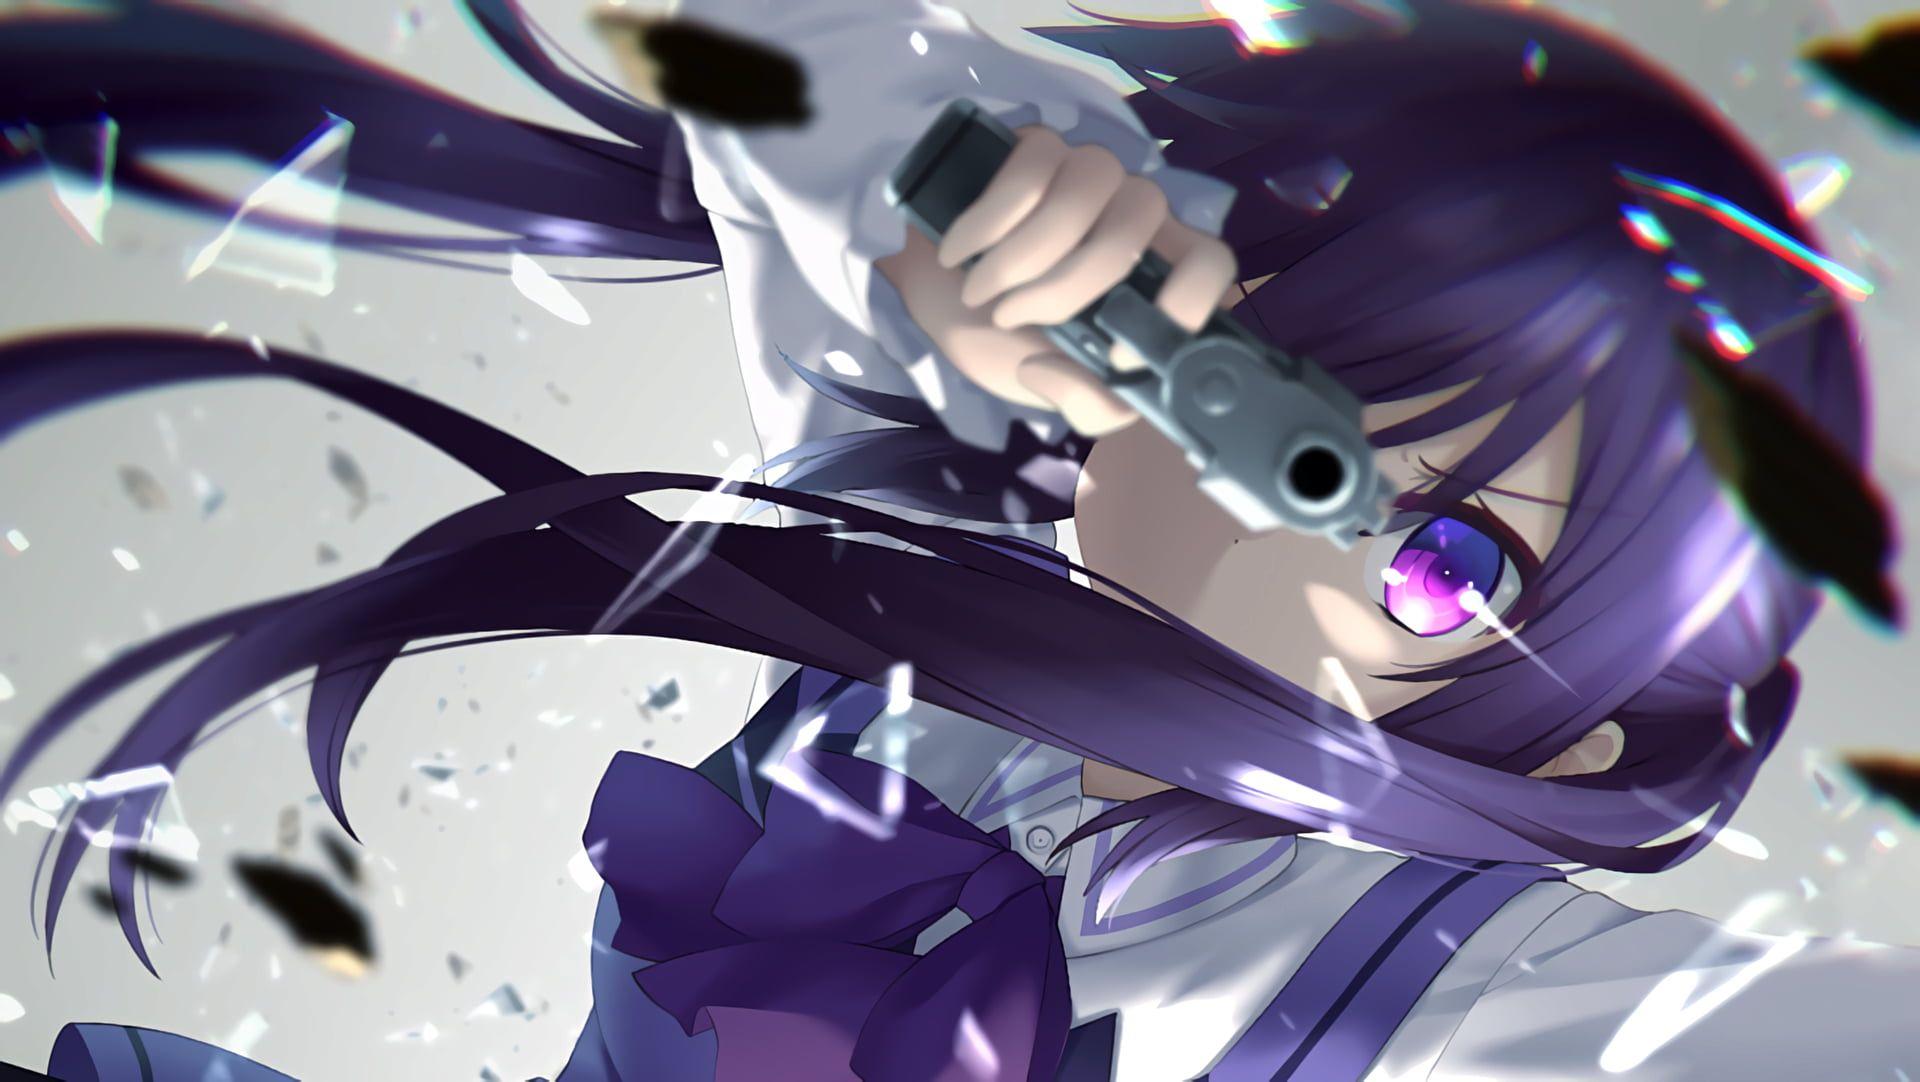 Purple Haired Female In Uniform Holding Pistol Anime Digital Wallpaper Anime Anime Girls Gochuumon Wa Usagi Desu Ka Purple Eyes Purple Hai Gambar Anime Gambar